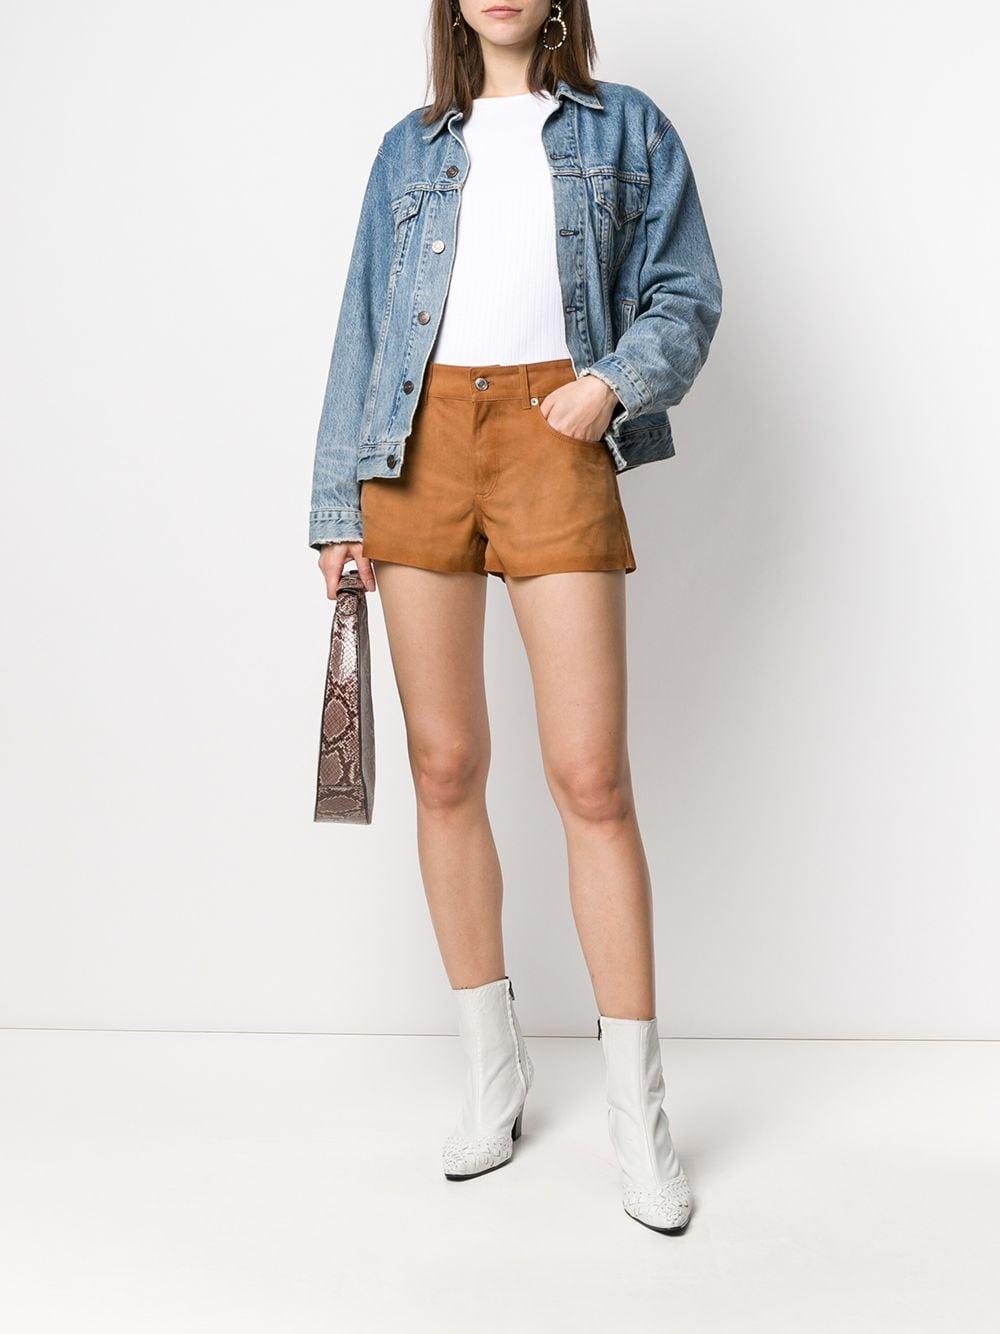 GOLDEN GOOSE DELUXE BRAND Shorts GOLDEN GOOSE   Shorts   G36WP109P3